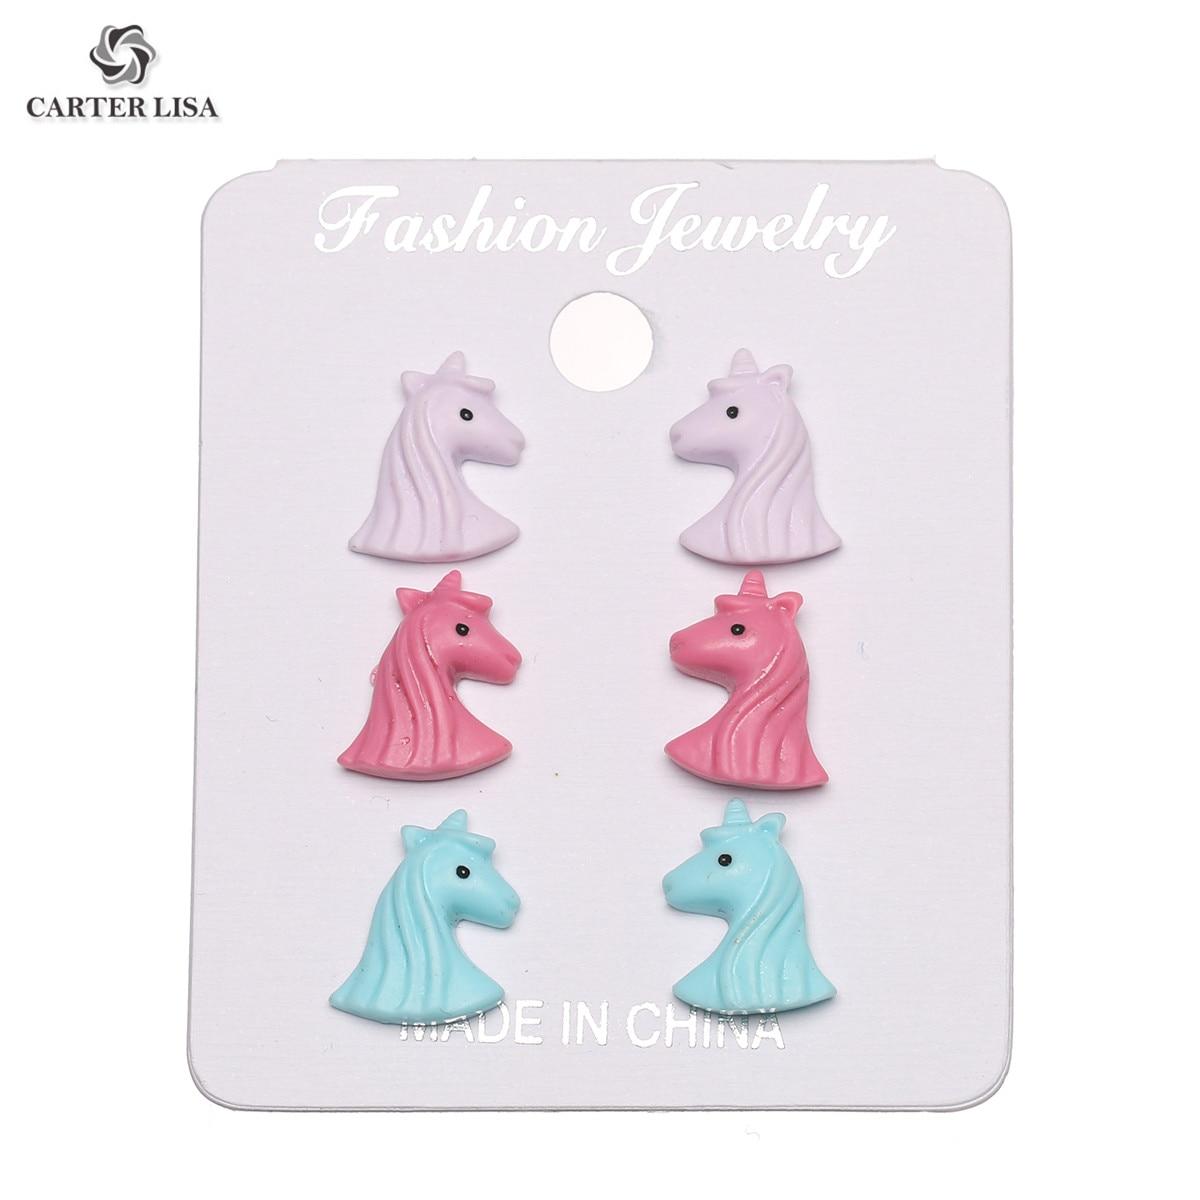 CARTER LISA Cute Handmade Candy Color Push Back Horse Head Animal Stud Earrings For Women & Girls